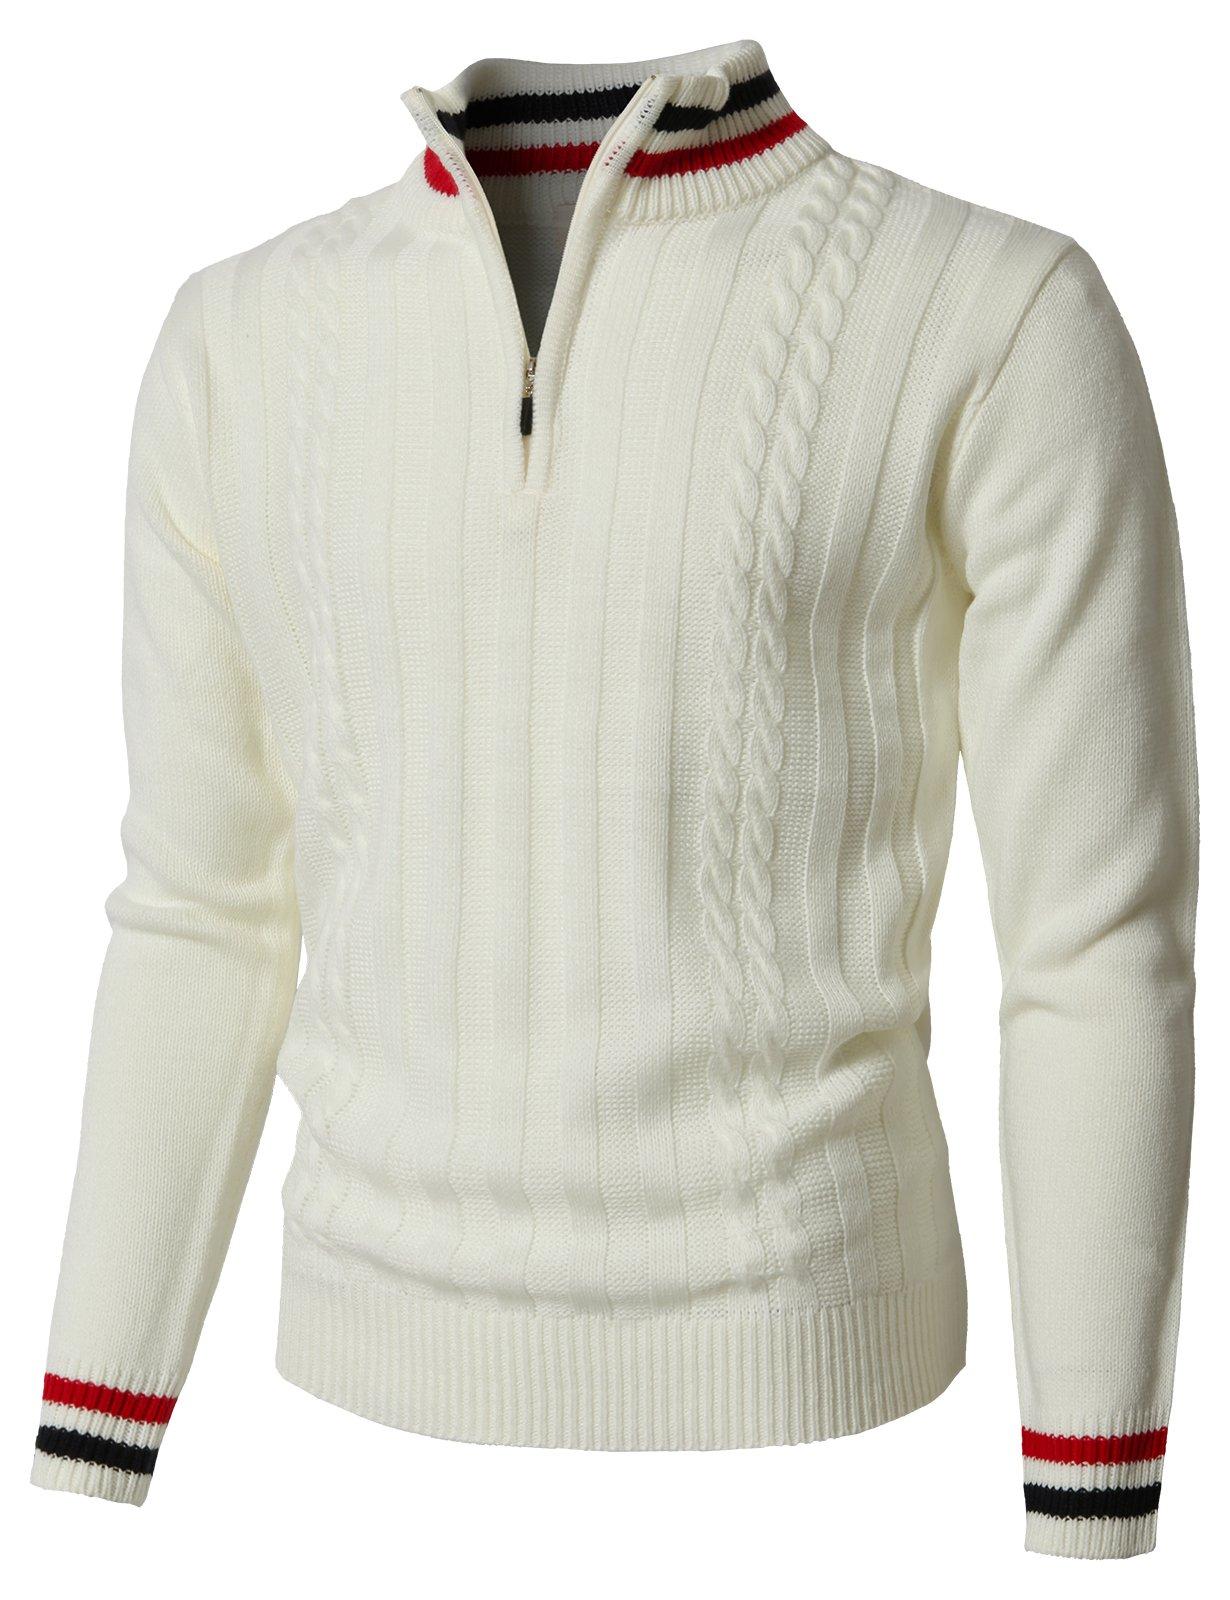 H2H Mens Half Zip Cashmere Blend Mens Sweater White US M/Asia L (KMOSWL0196)